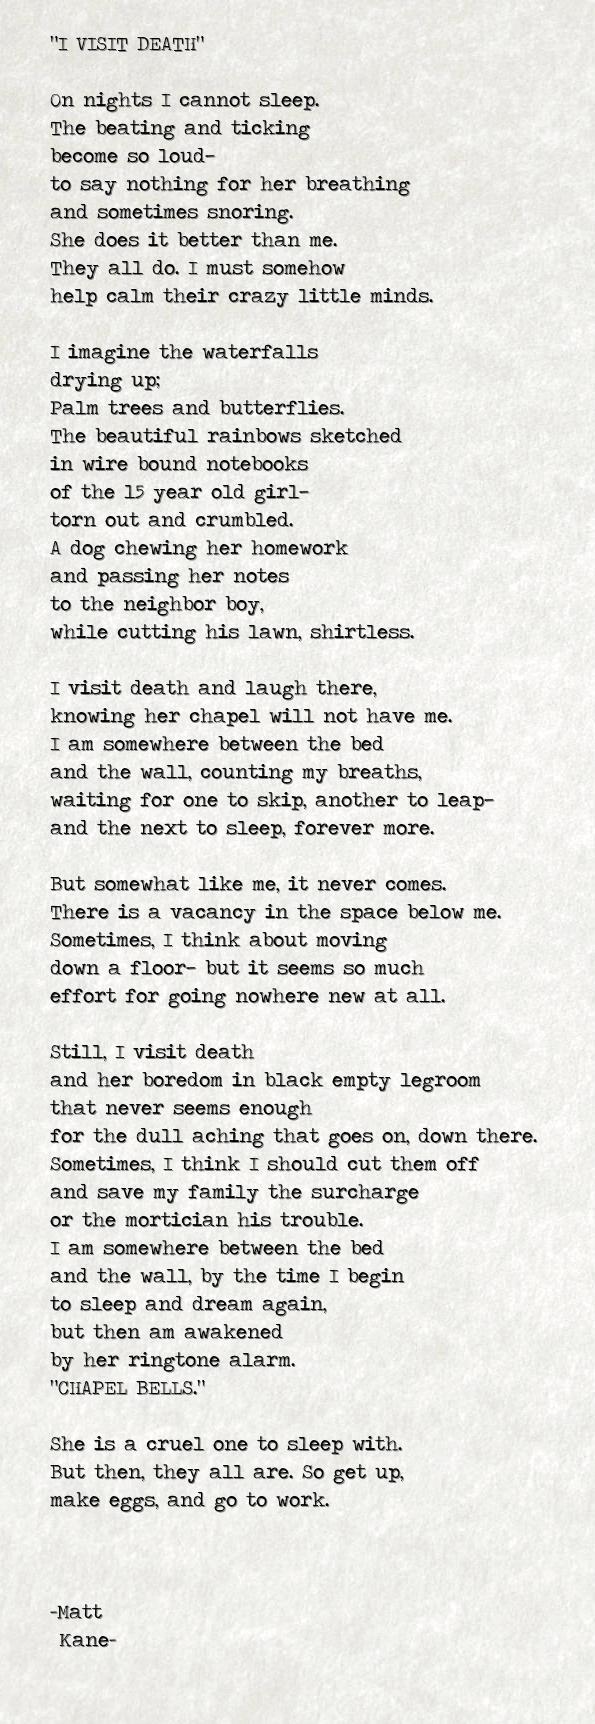 I VISIT DEATH - a poem by Matt Kane